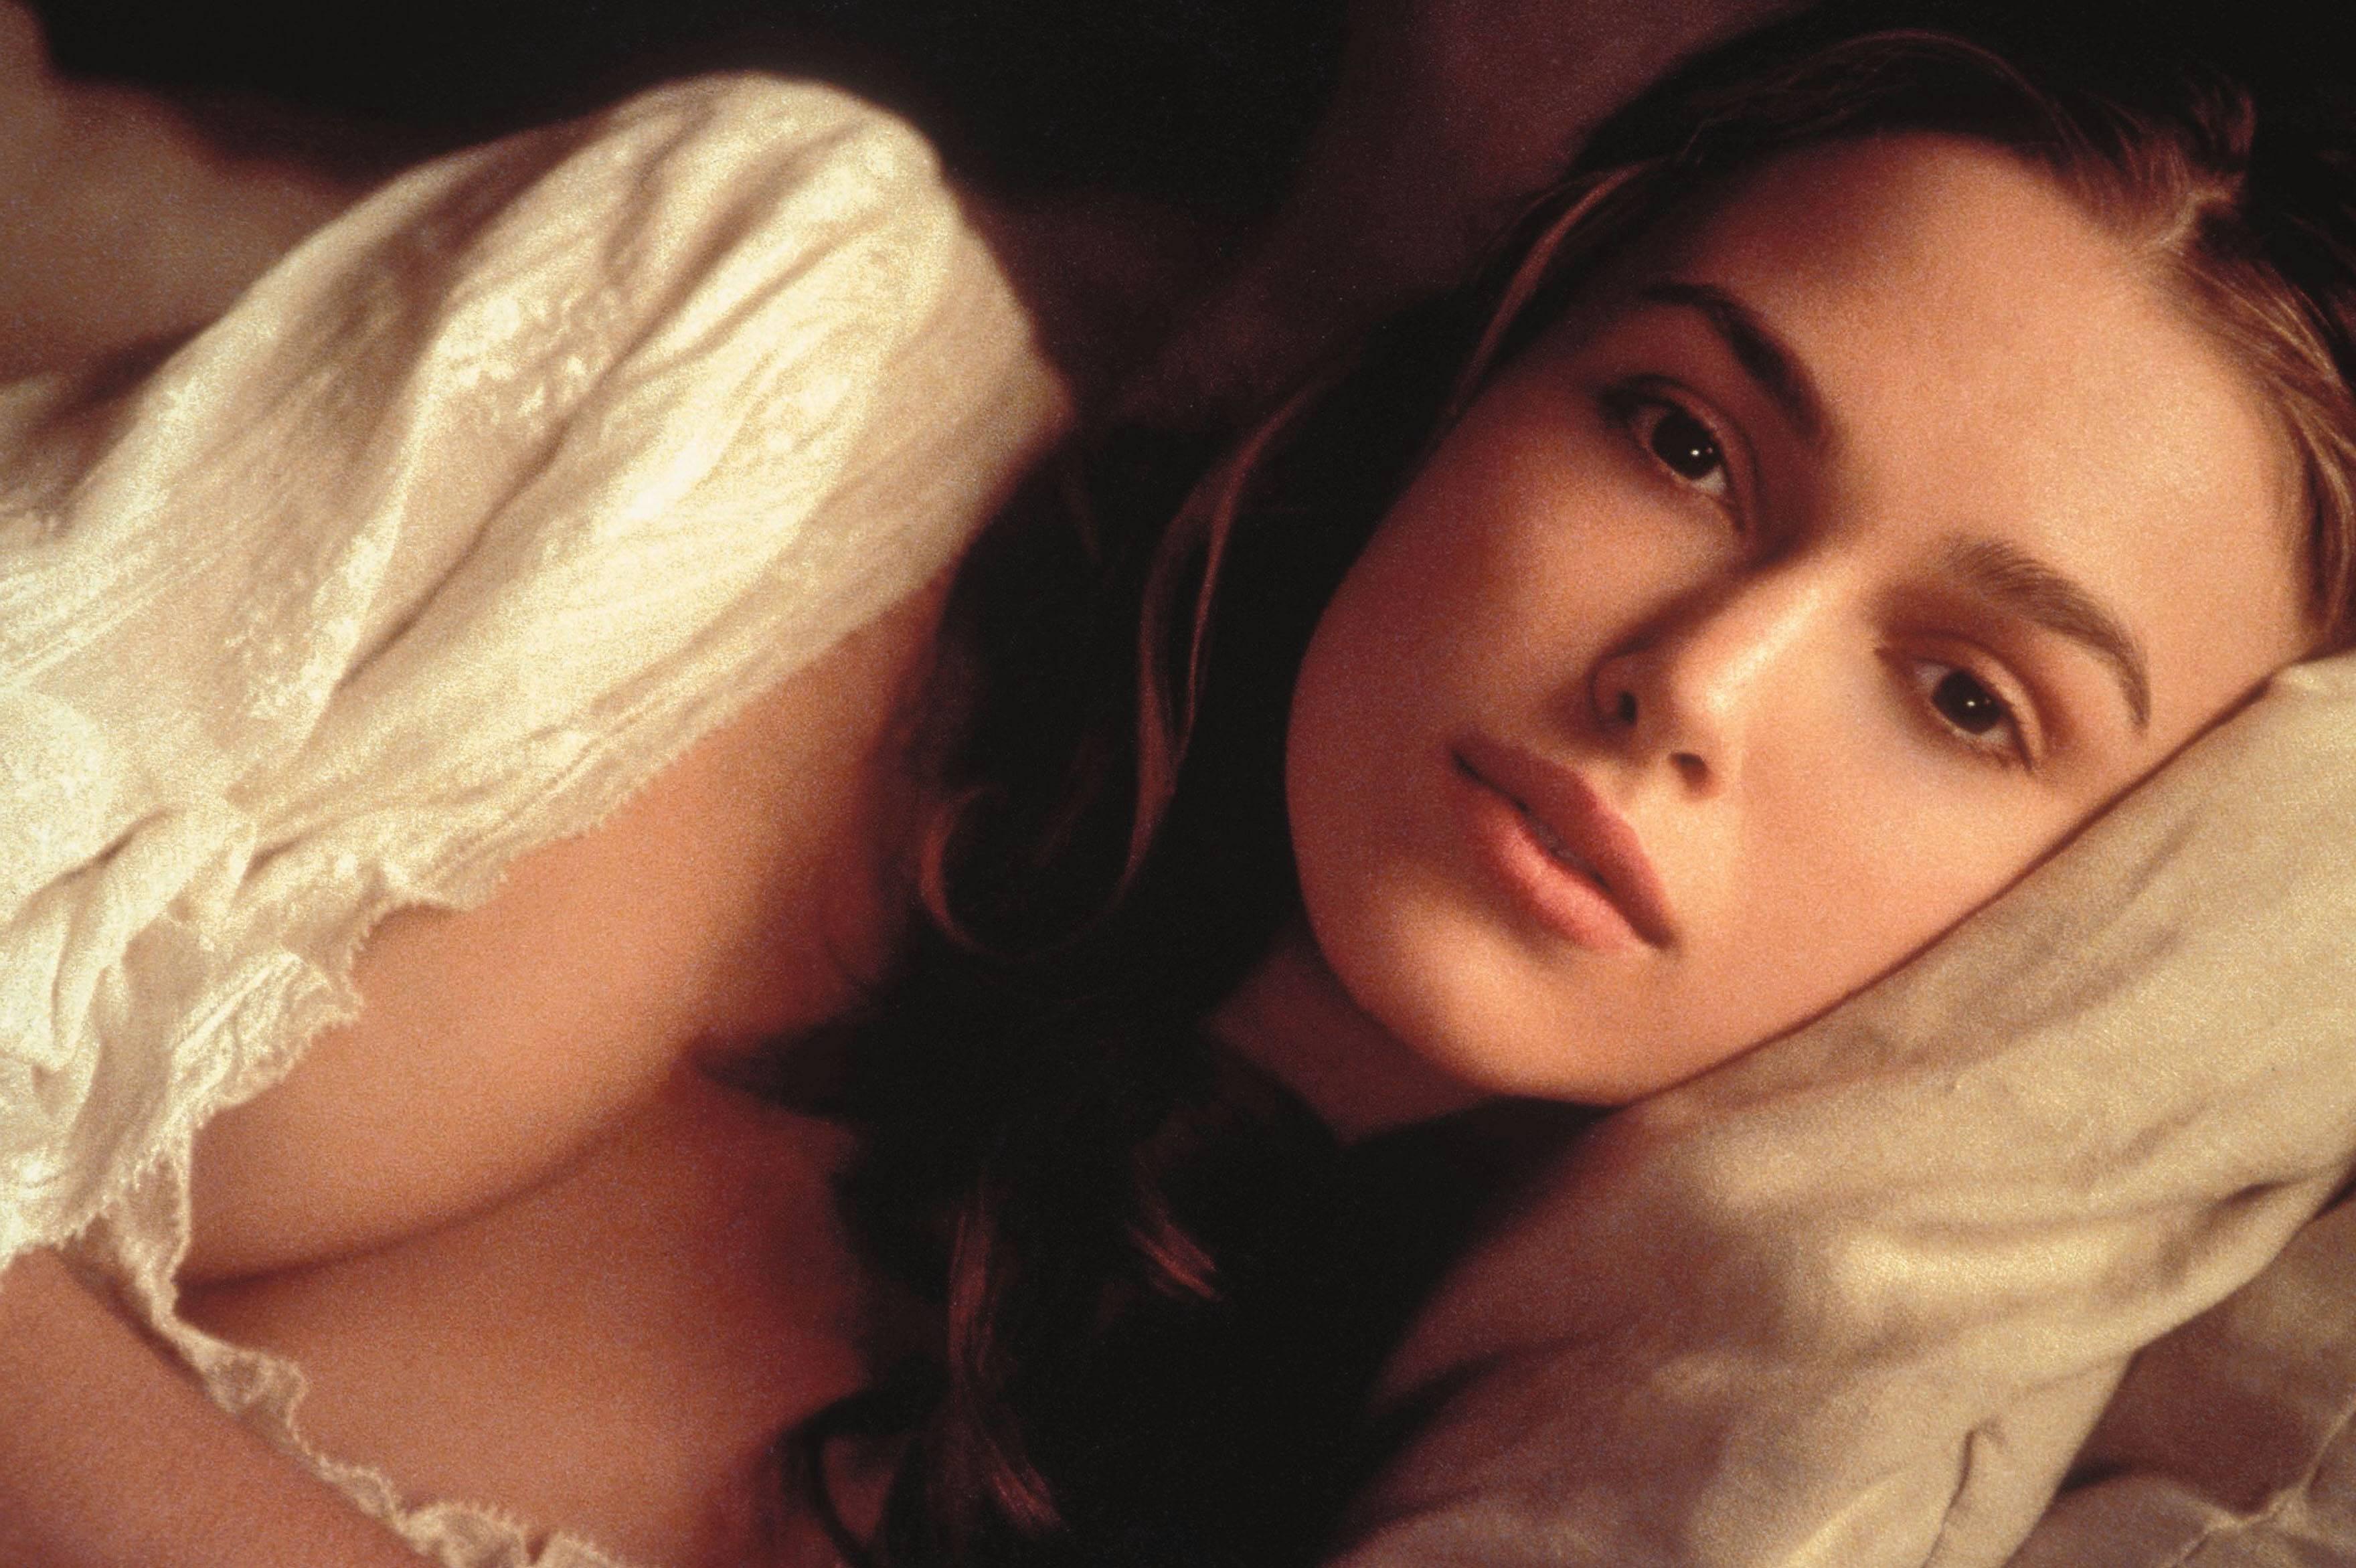 File:Elizabeth bed.jpg